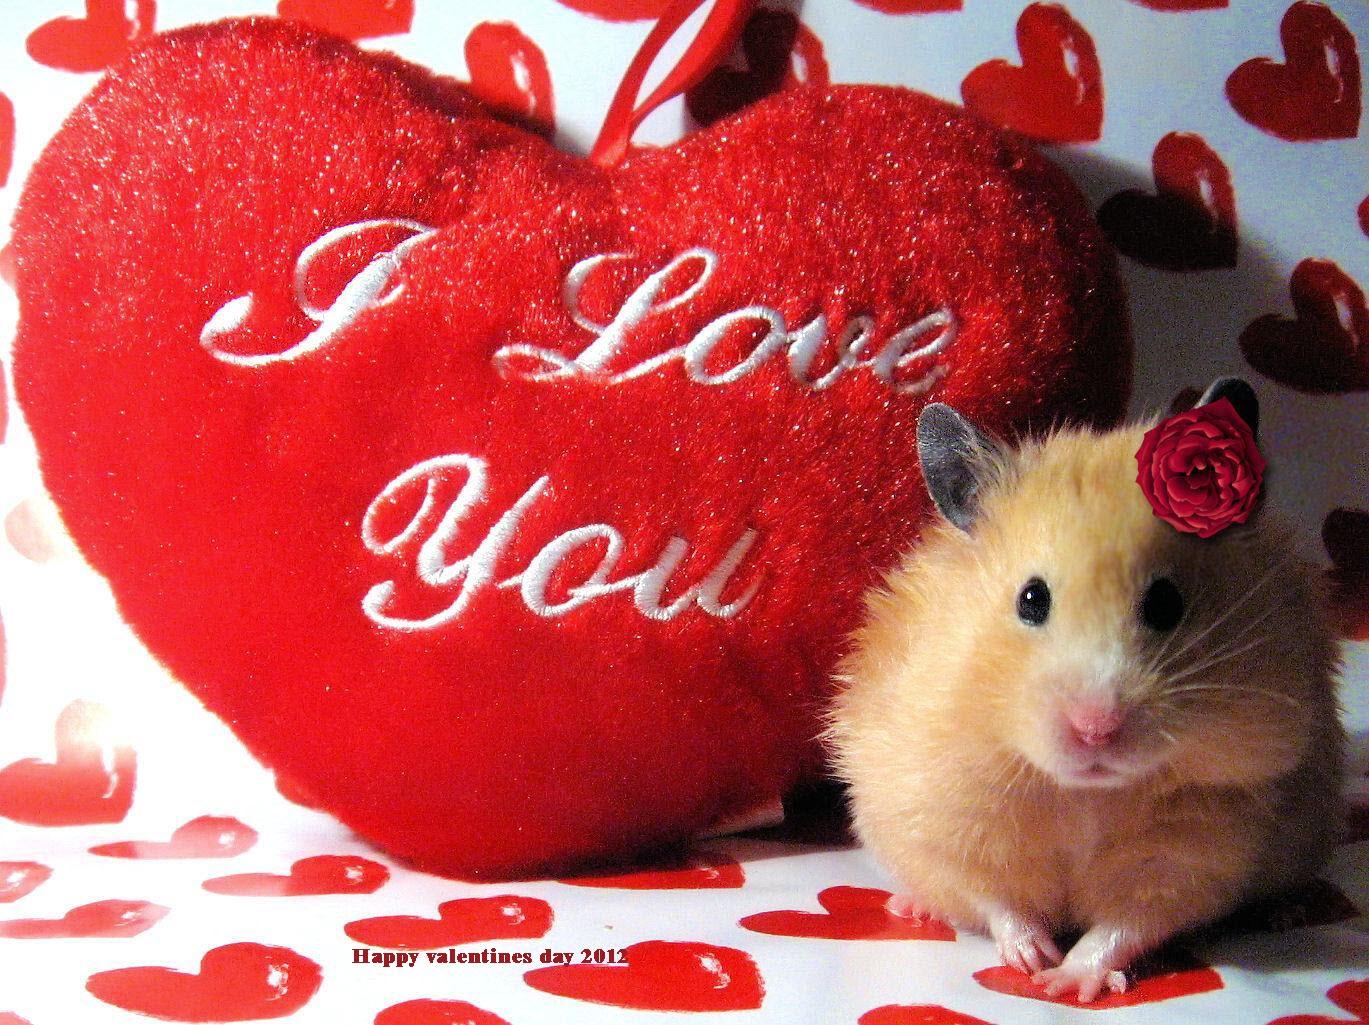 Happy valentines day i love you so much valentines day info happy valentines day i love you so much kristyandbryce Gallery